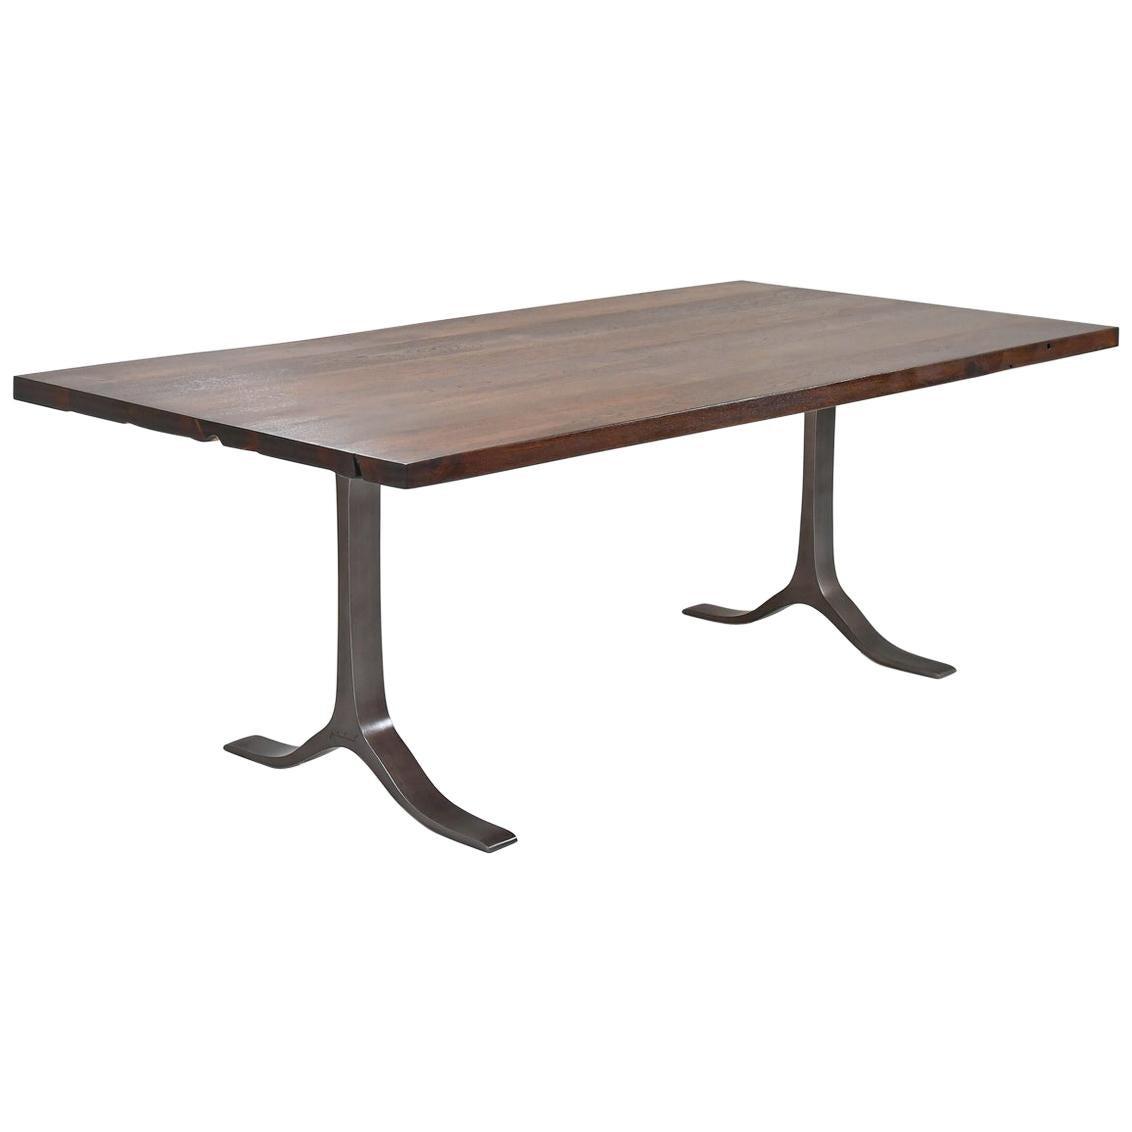 Bespoke Table, Reclaimed Teak wood, Sand cast Aluminum Bases by P. Tendercool